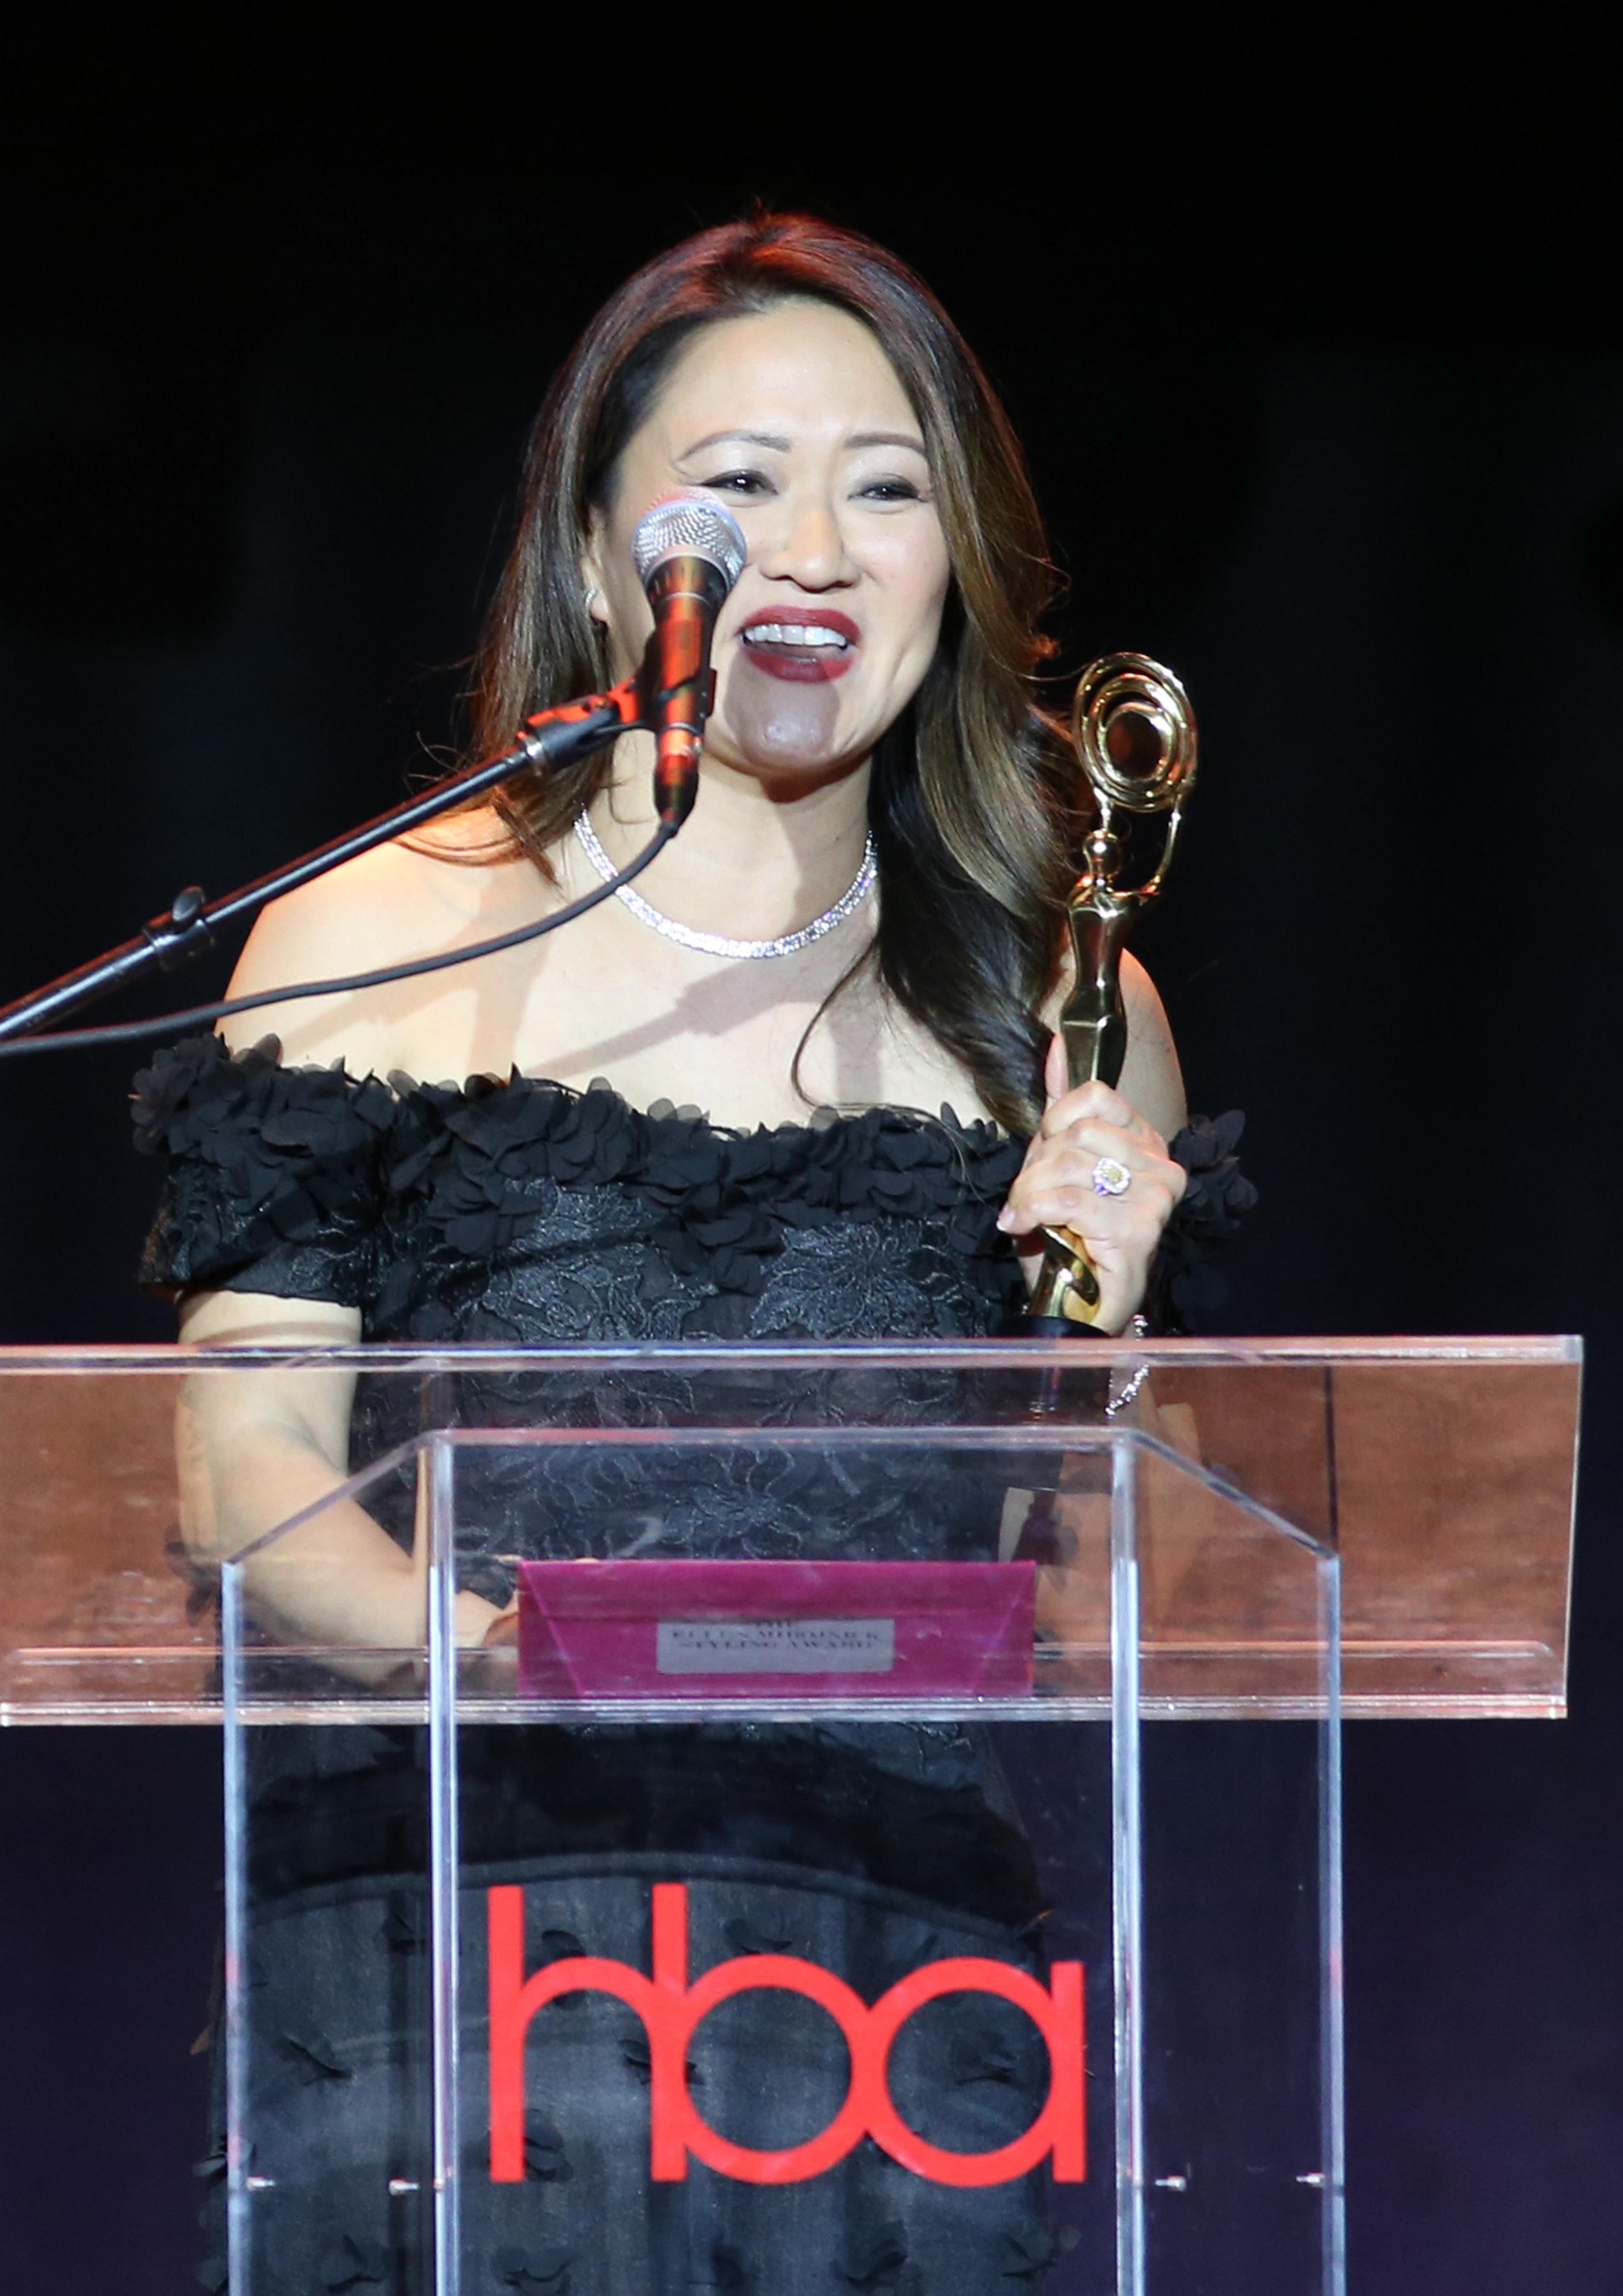 Desiree Nutley | Feb 25, 2018, Hollywood Beauty Awards held at the Avalon